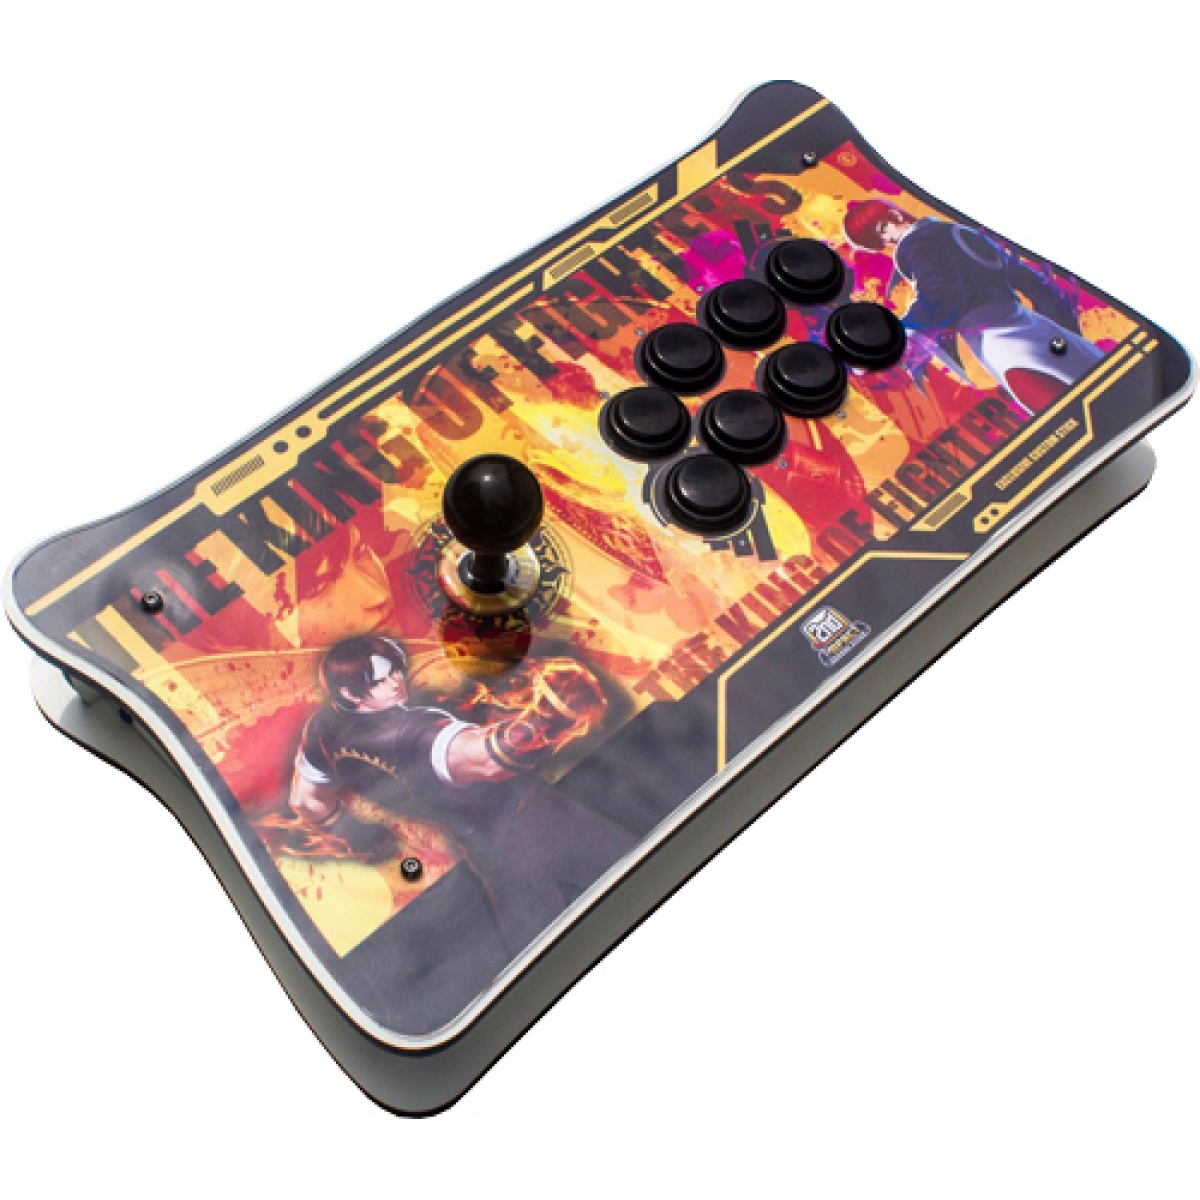 Controle Arcade para PC e PS3 2ND Impact KOF MDF Manche Optico Silent